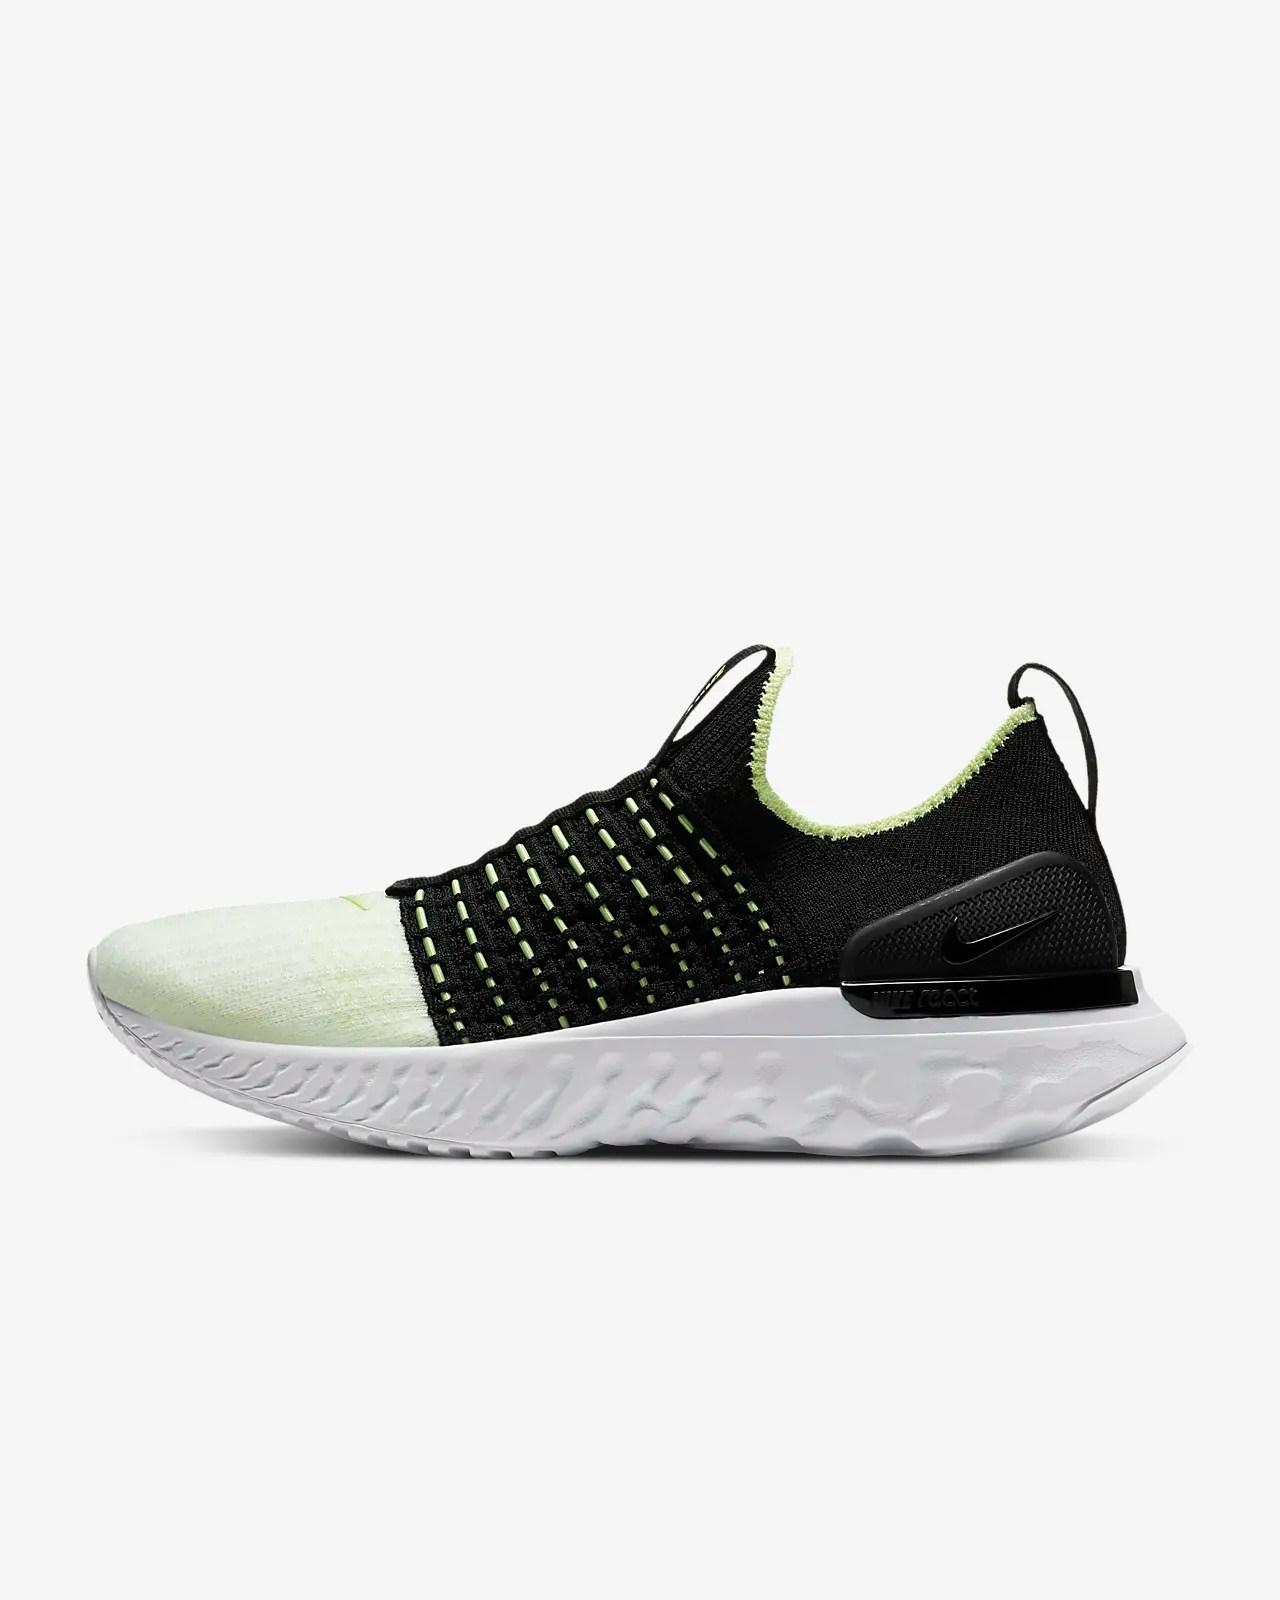 Nike React Phantom Run Flyknit 2 'Barely Volt / Black' .99 Free Shipping